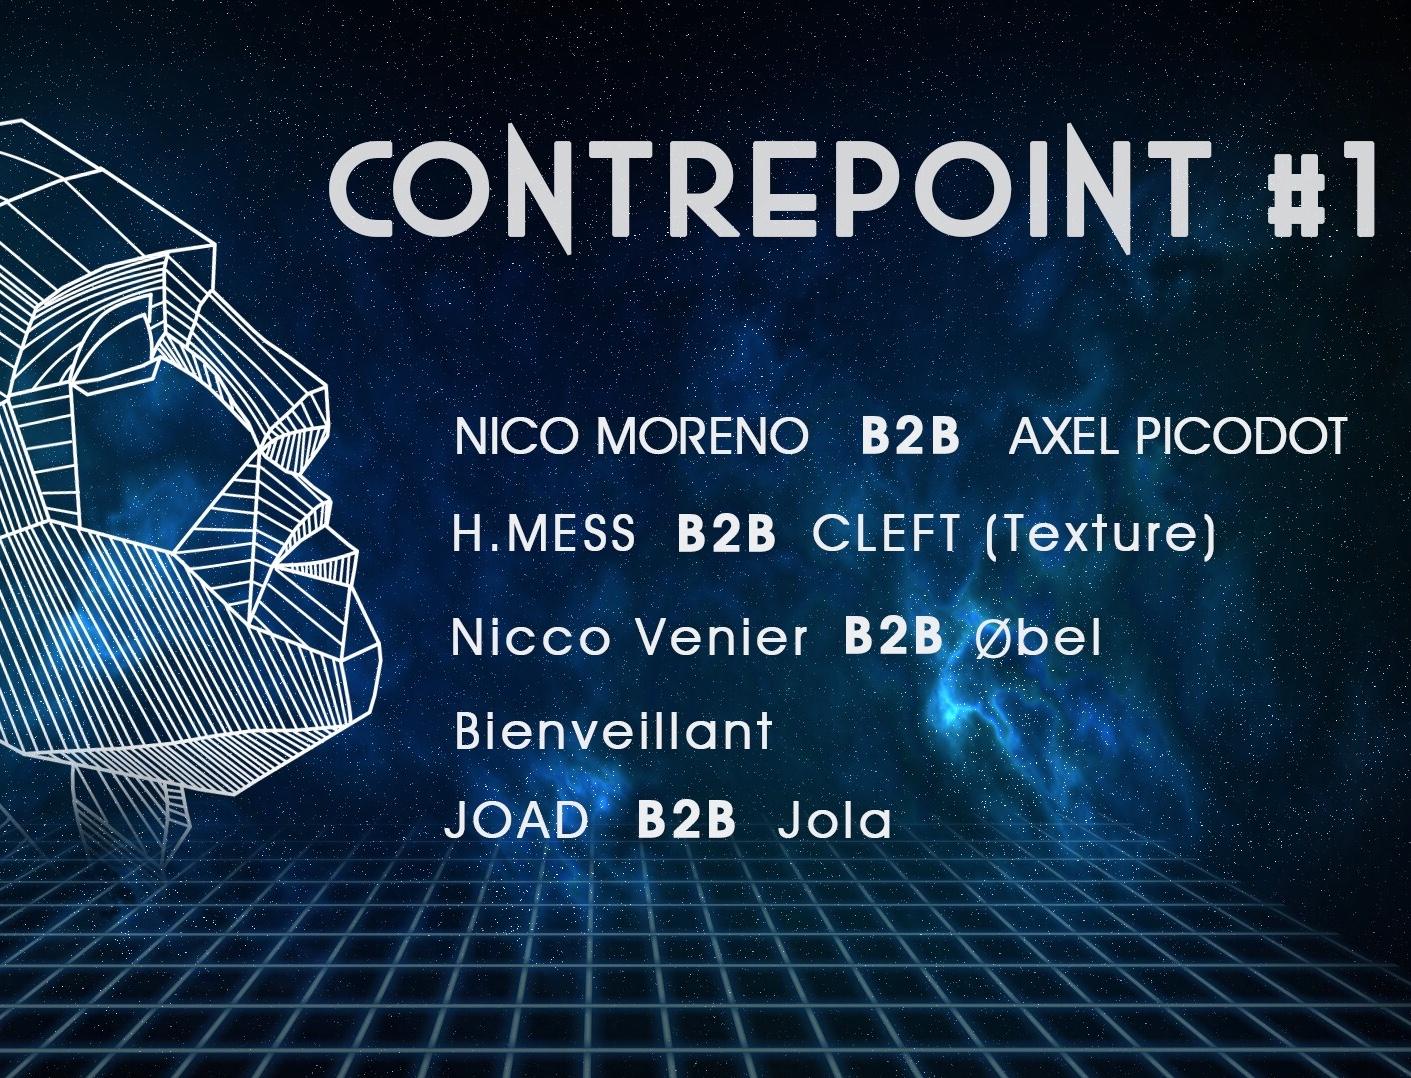 Contrepoint #1 : Nico Moreno b2b Axel Picodot, Texture & More